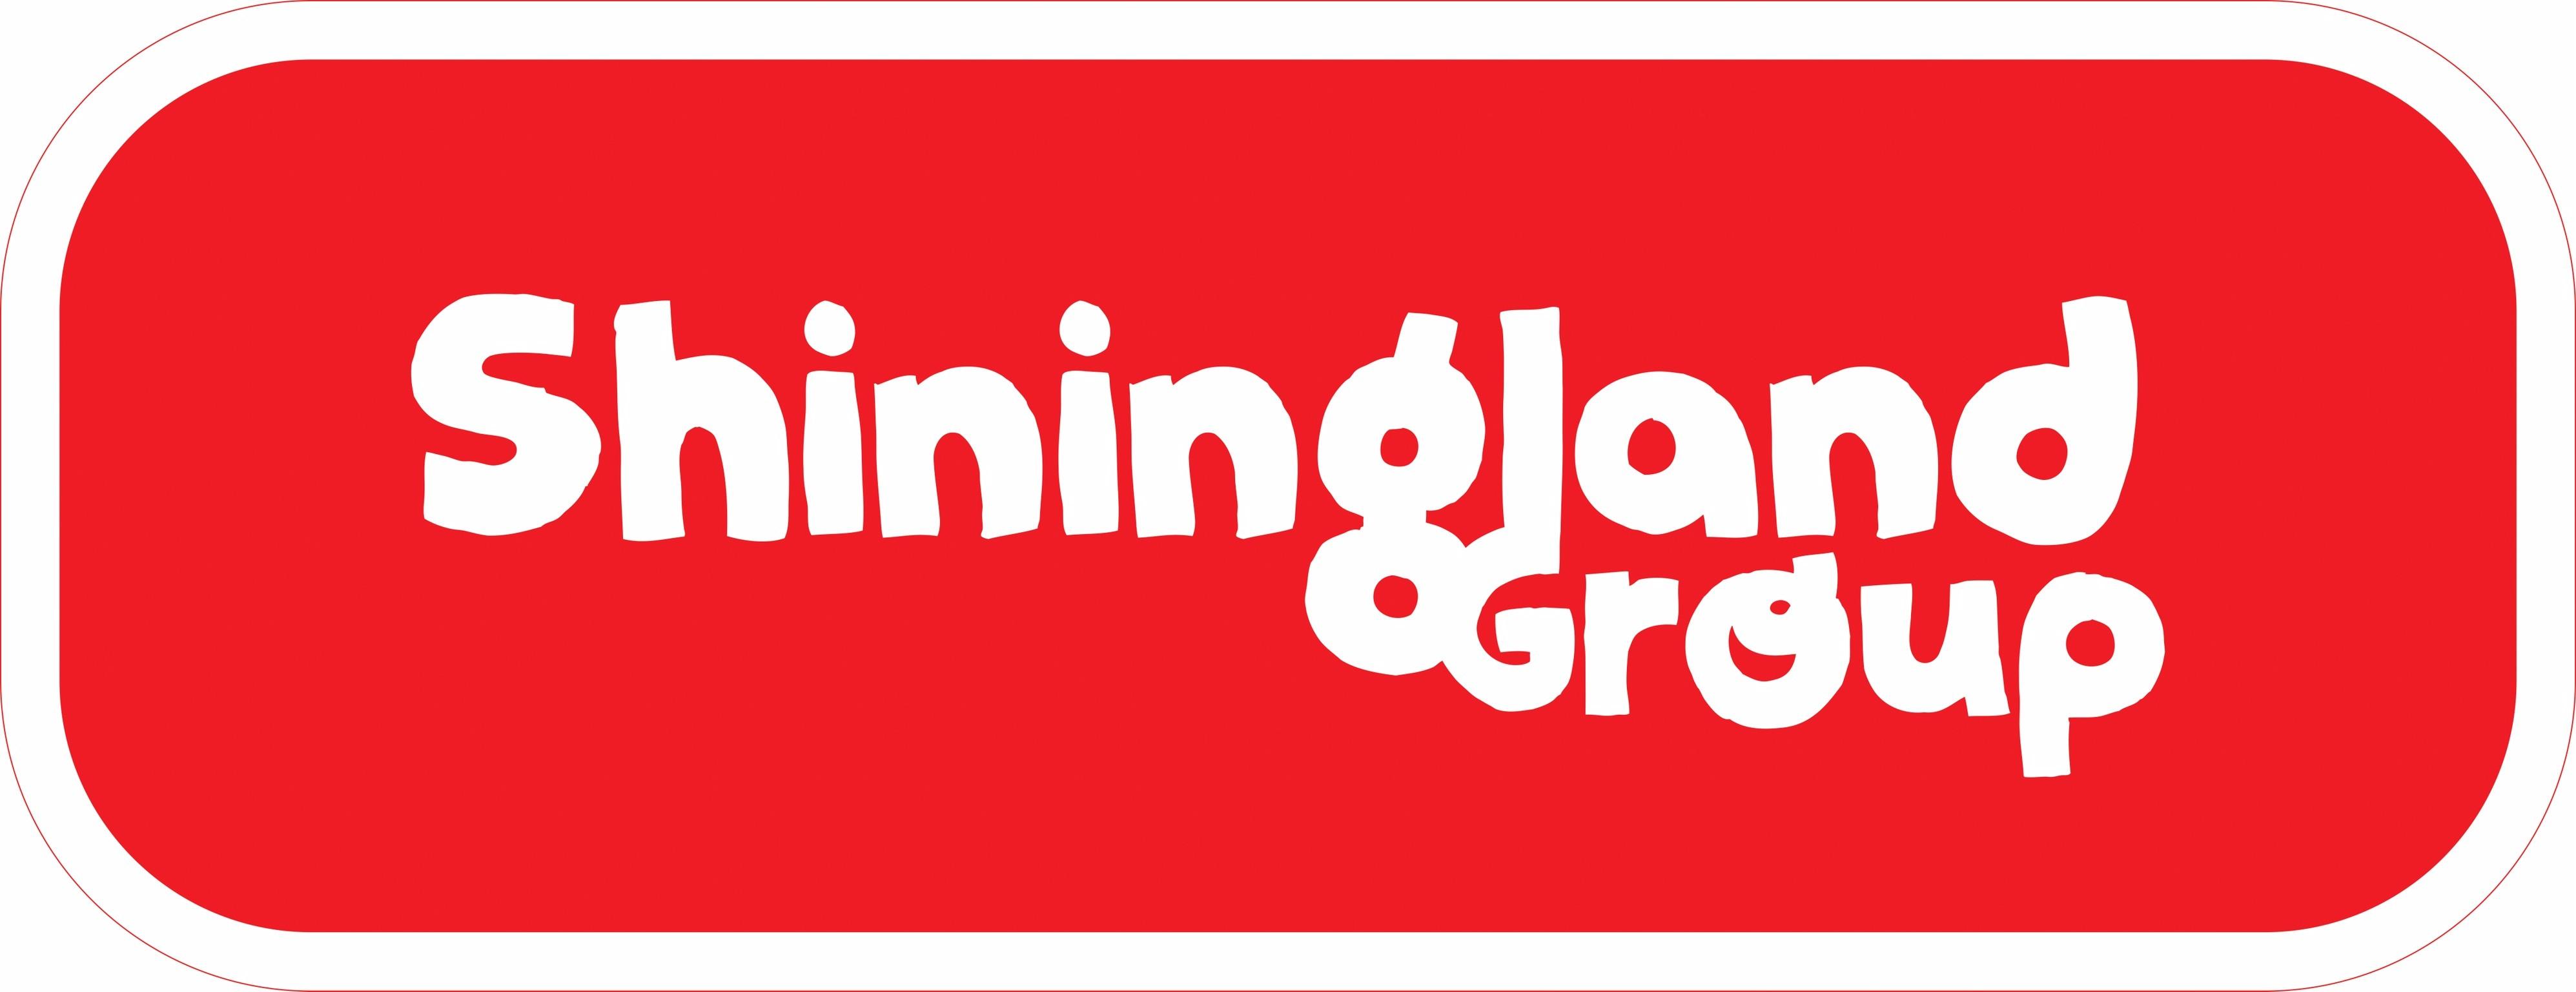 Shiningland Group